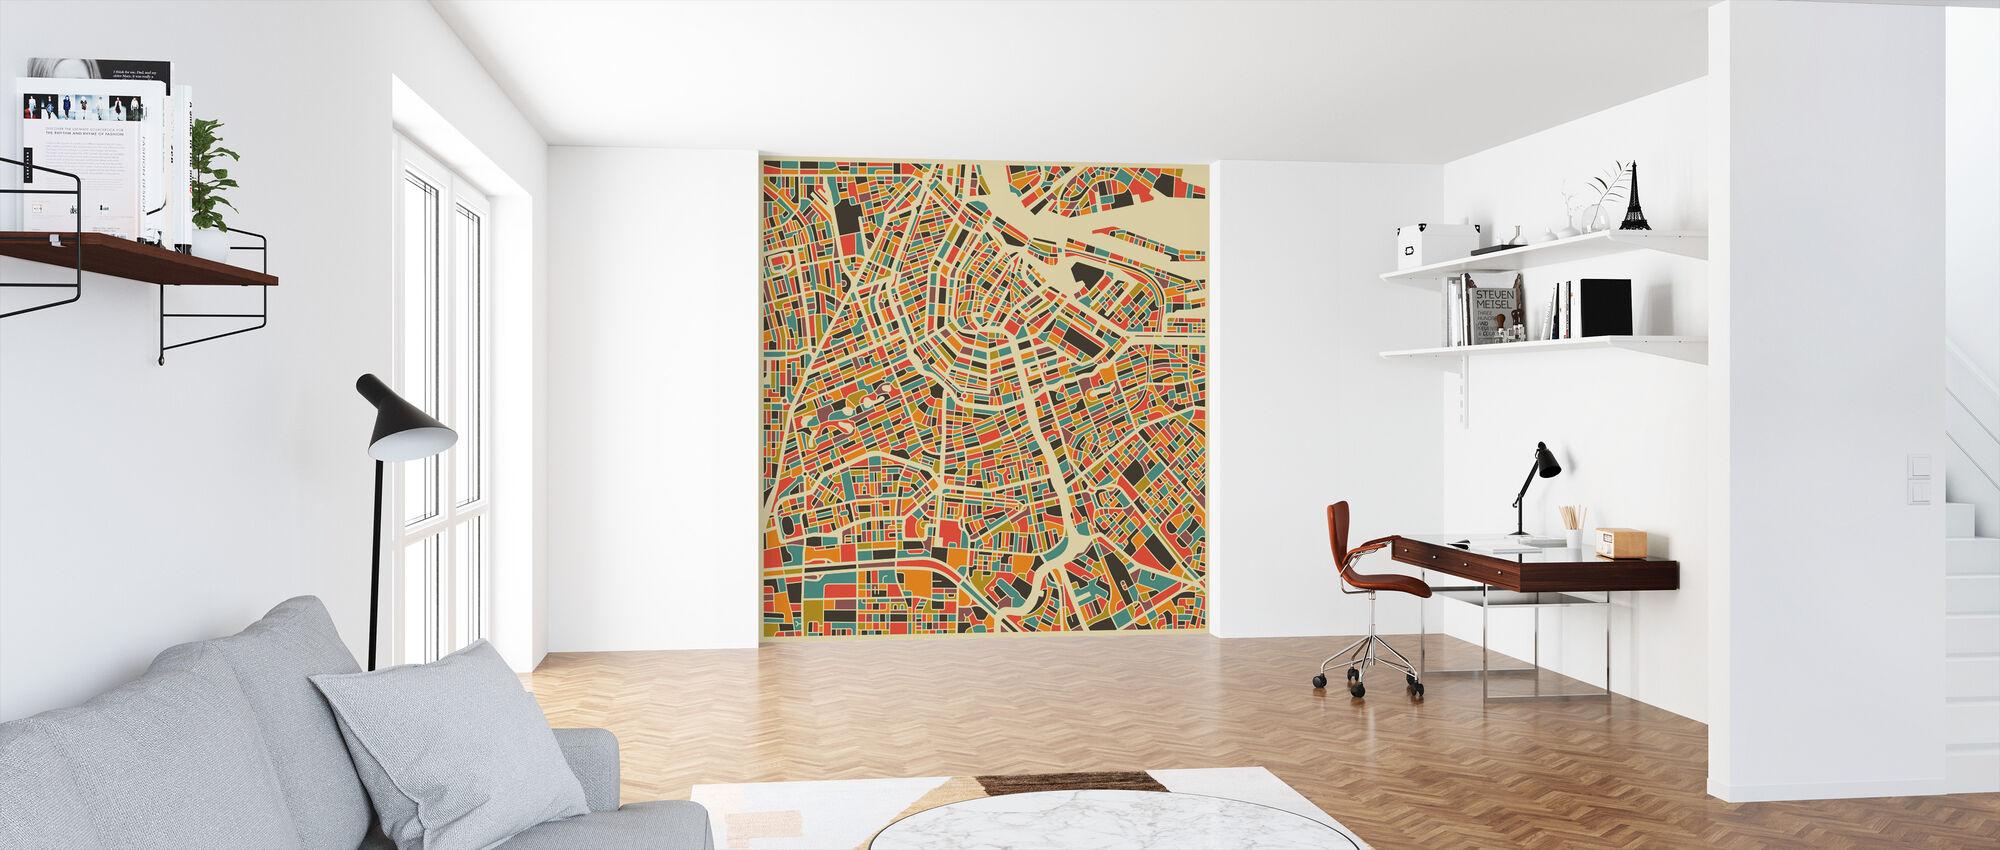 Multicolor Map - Amsterdam - Wallpaper - Office